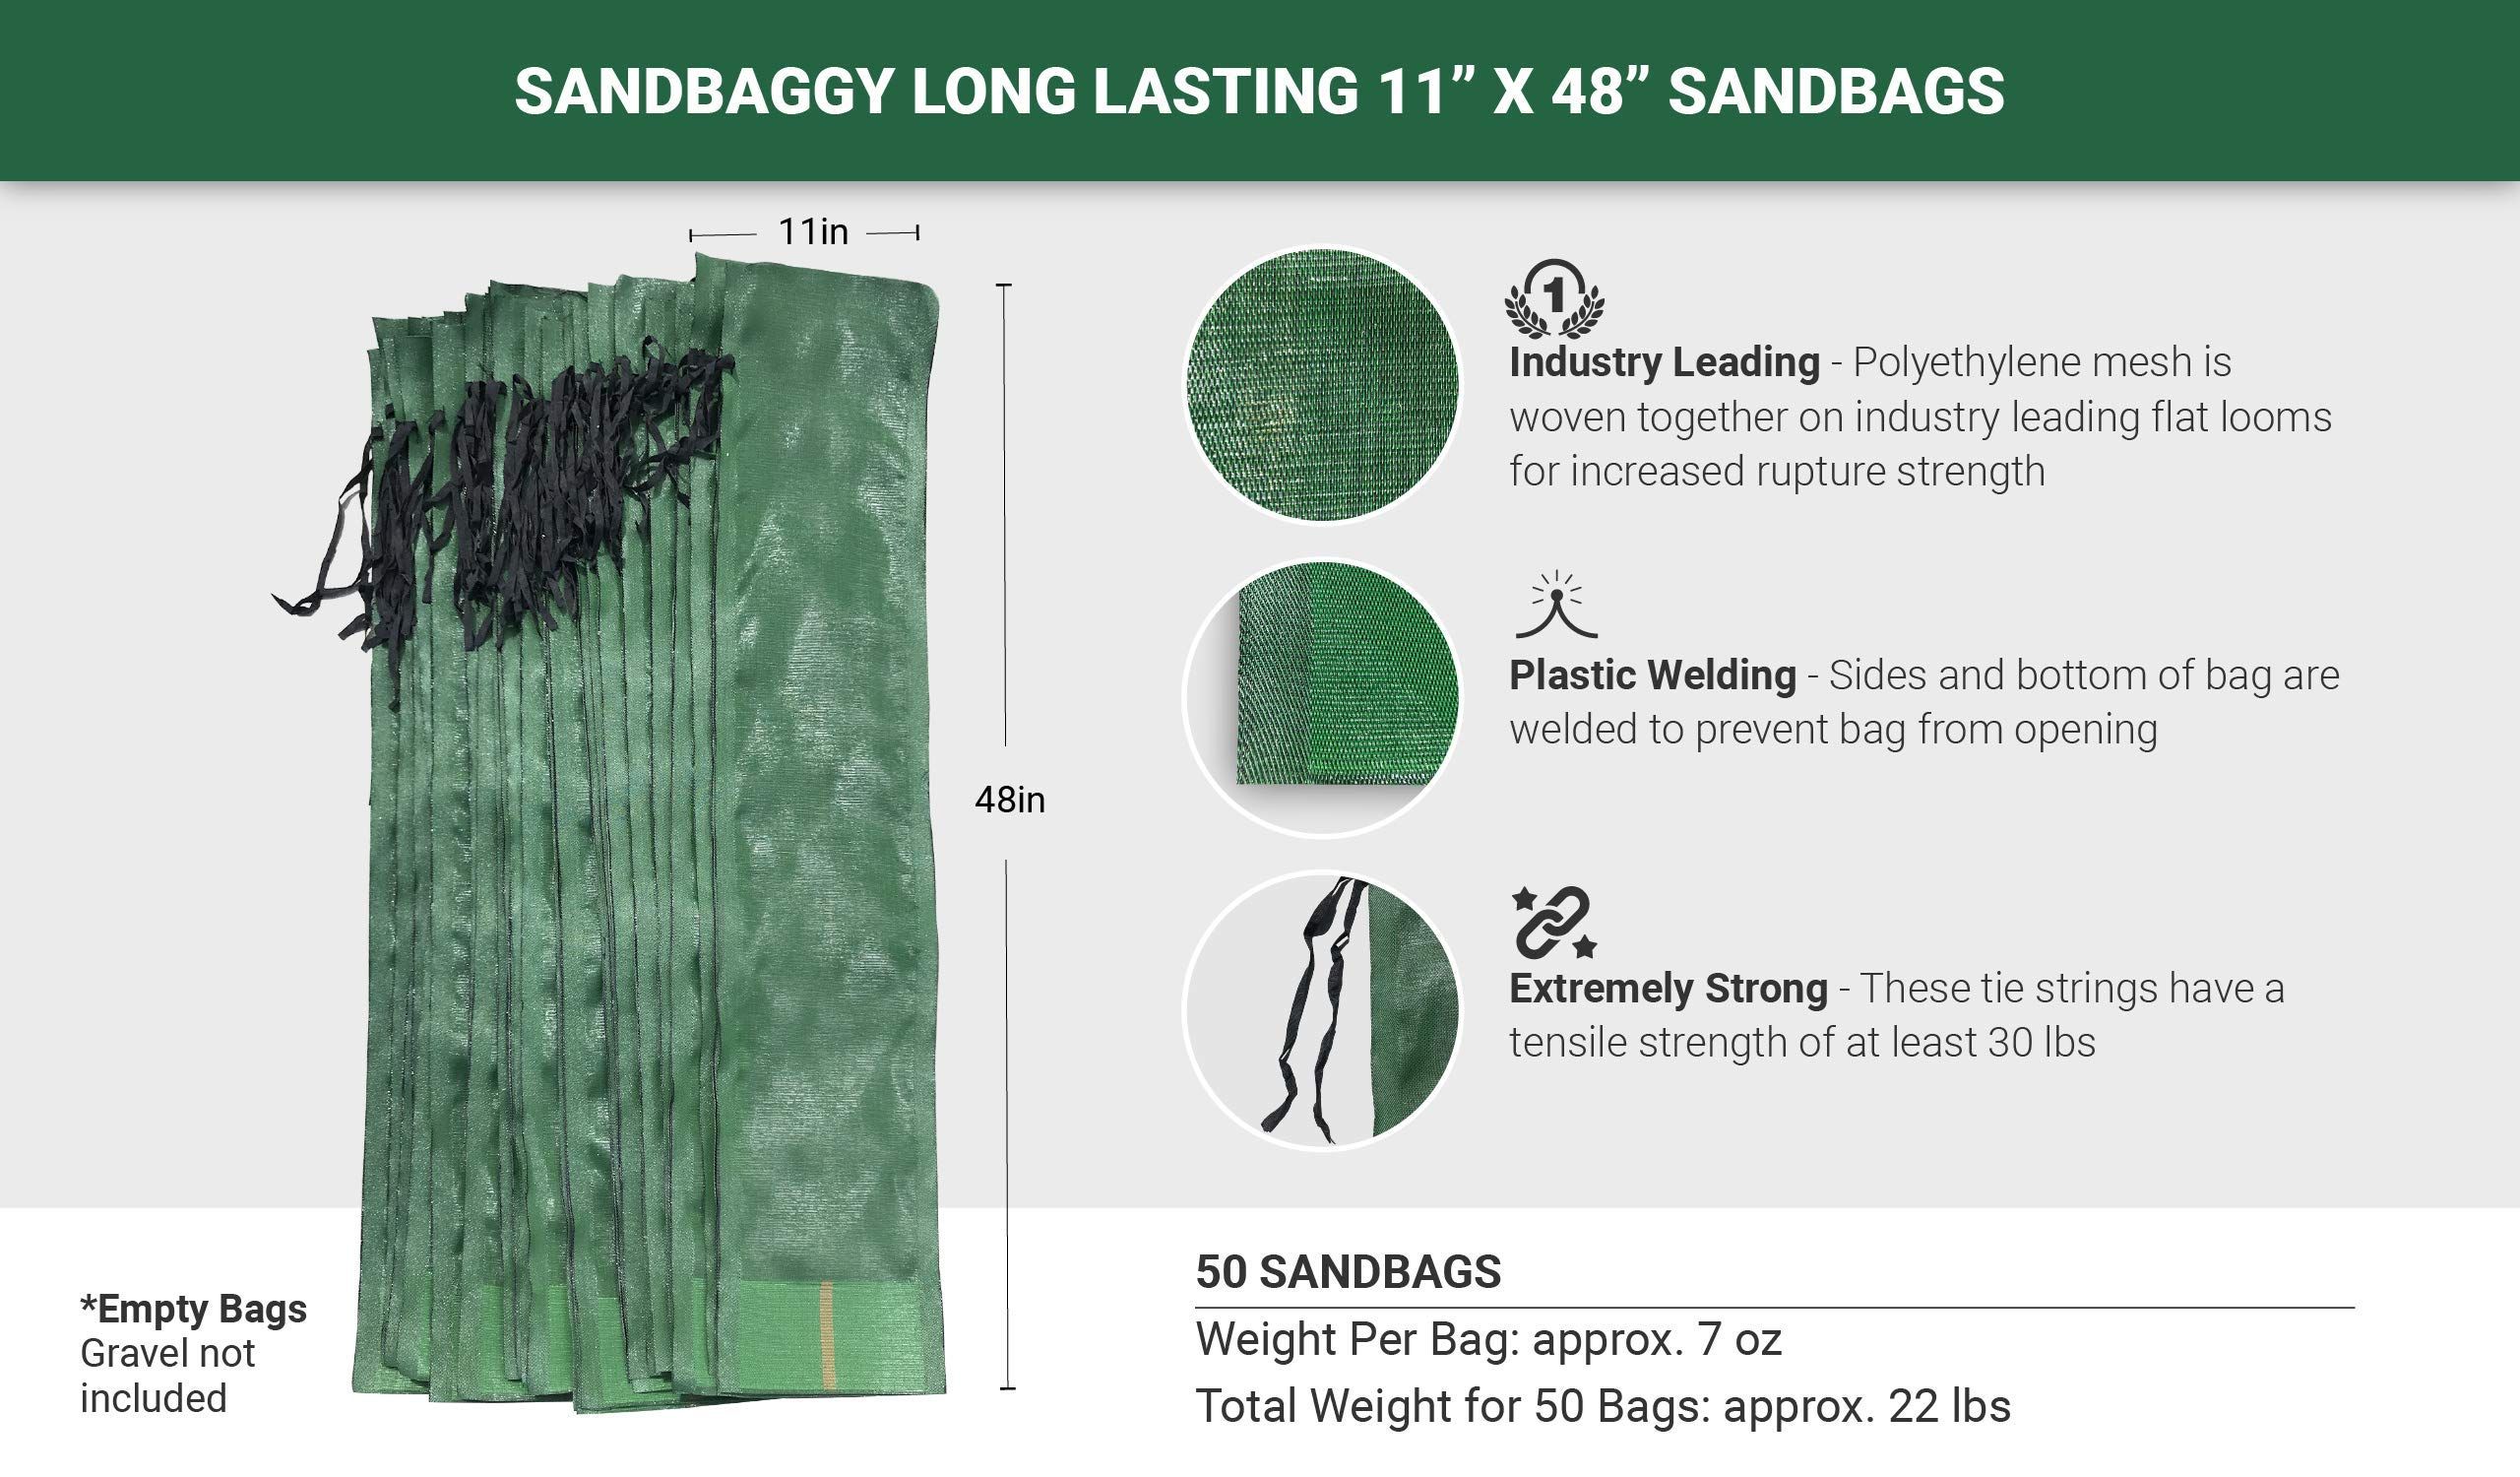 Sandbaggy - 11'' x 48'' Long-Lasting Sandbags - Lasts 1-2 Yrs - Sandbags for Flooding - Monofilament - Sand Bag - Flood Water Barrier - Water Curb - Tent Sandbags - Store Bags (Pack of 50)